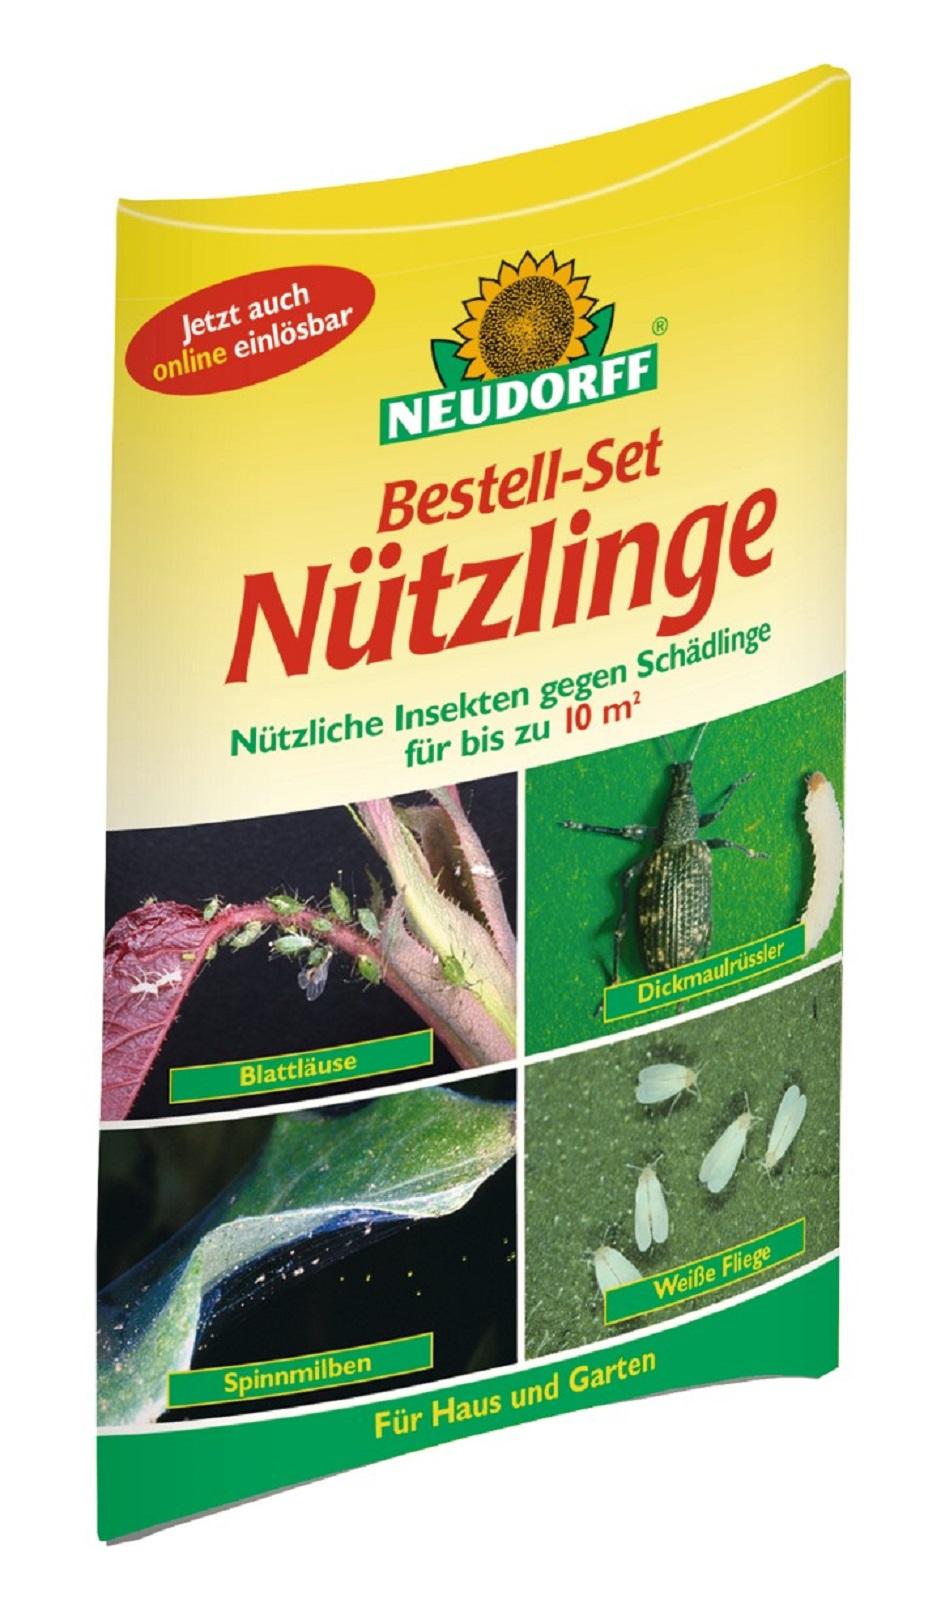 Neudorff Bestellset Nützlinge gegen Schadinsekten 10 qm